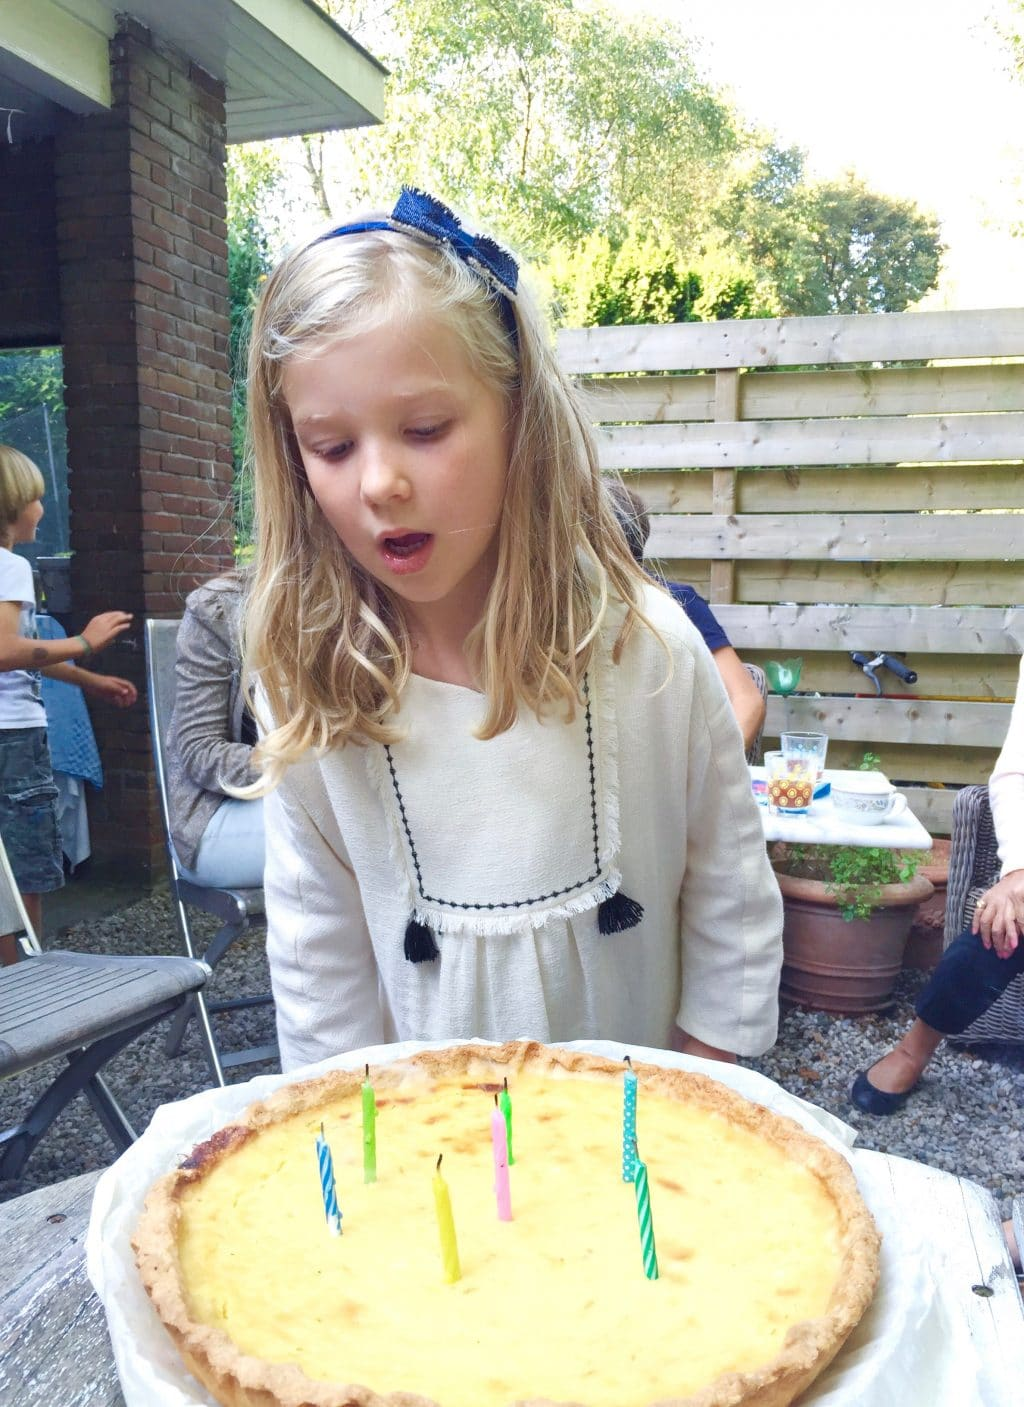 verjaardagskaart, verjaardagskaart versturen, made by ellen, postaal, post, verjaardag, kaartje en taart made by ellen